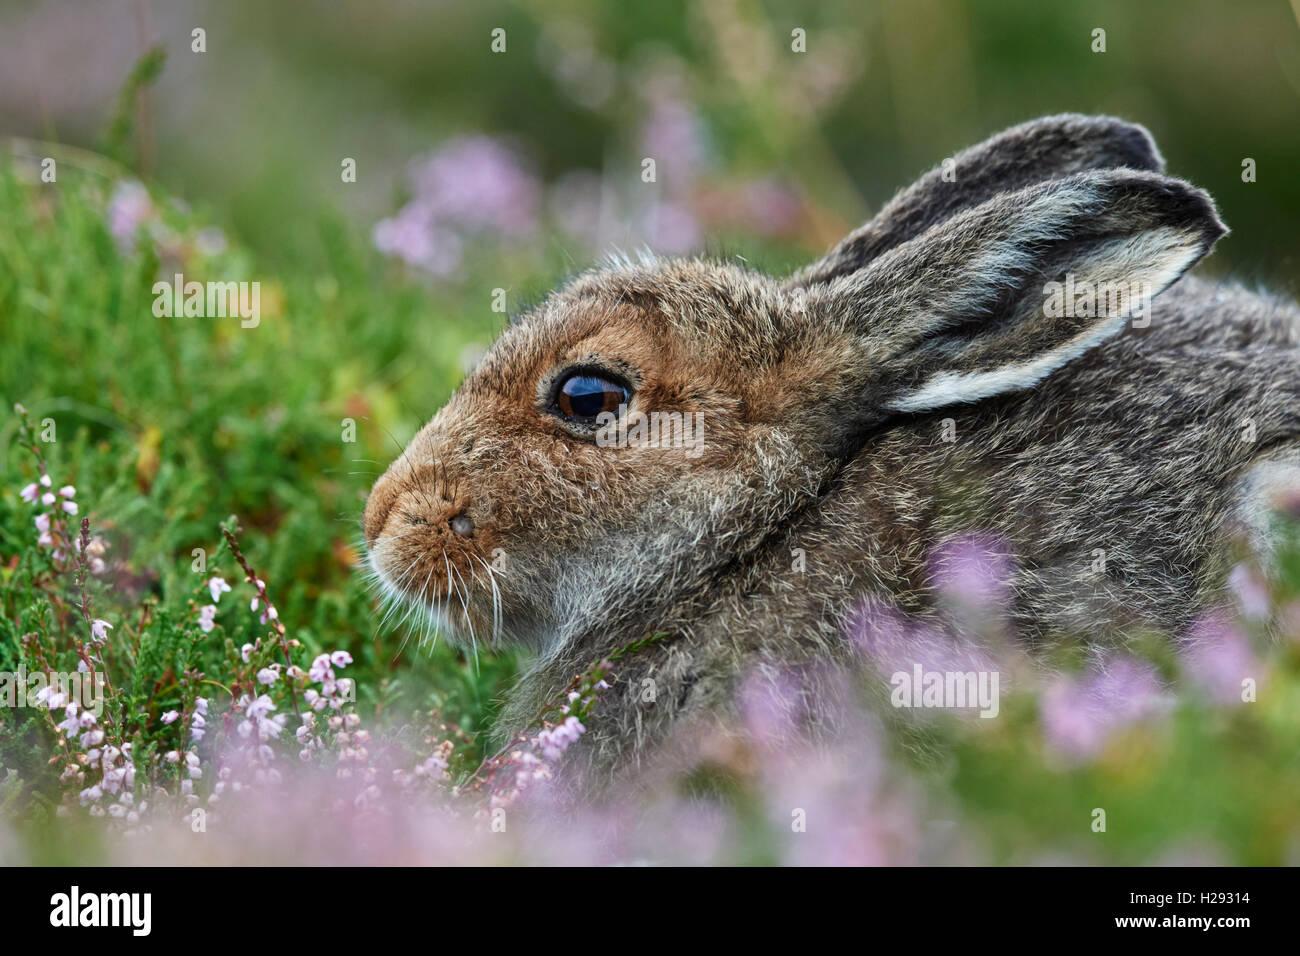 Mountain hare (Lepus timidus), Scotland, UK - Stock Image